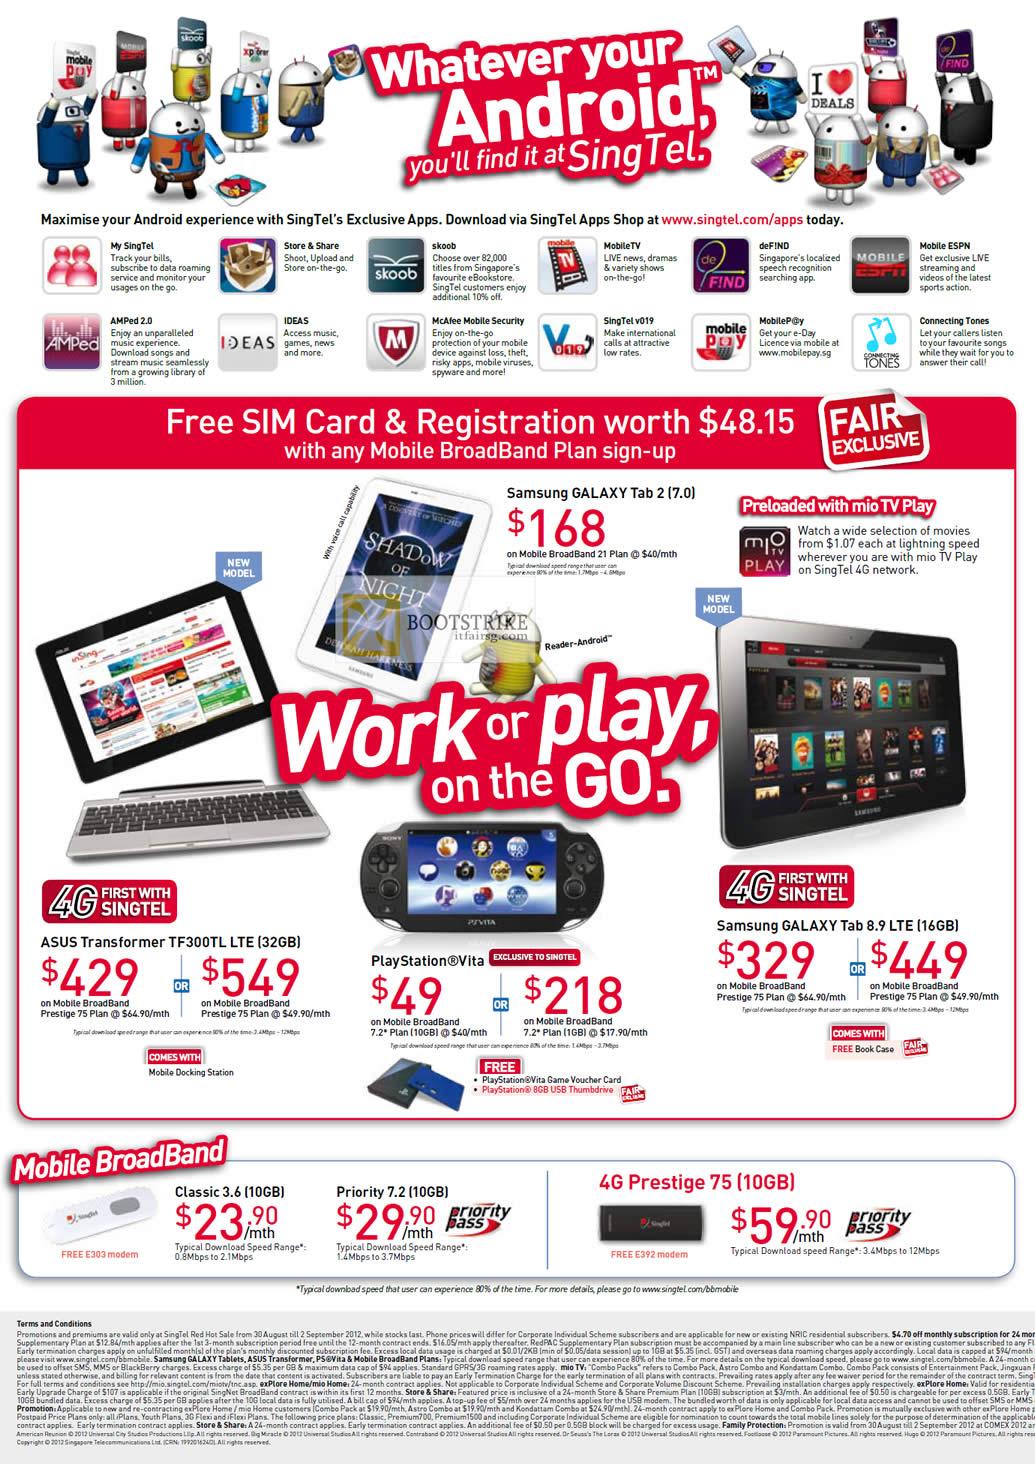 COMEX 2012 price list image brochure of Singtel Free SIM Card Registration, Samsung Galaxy Tab 2 7.0, Galaxy Tab 8.9 LTE, ASUS Transformer TF300TL LTE, Playstation Vita, 4G Prestige 75, Classic, Priority